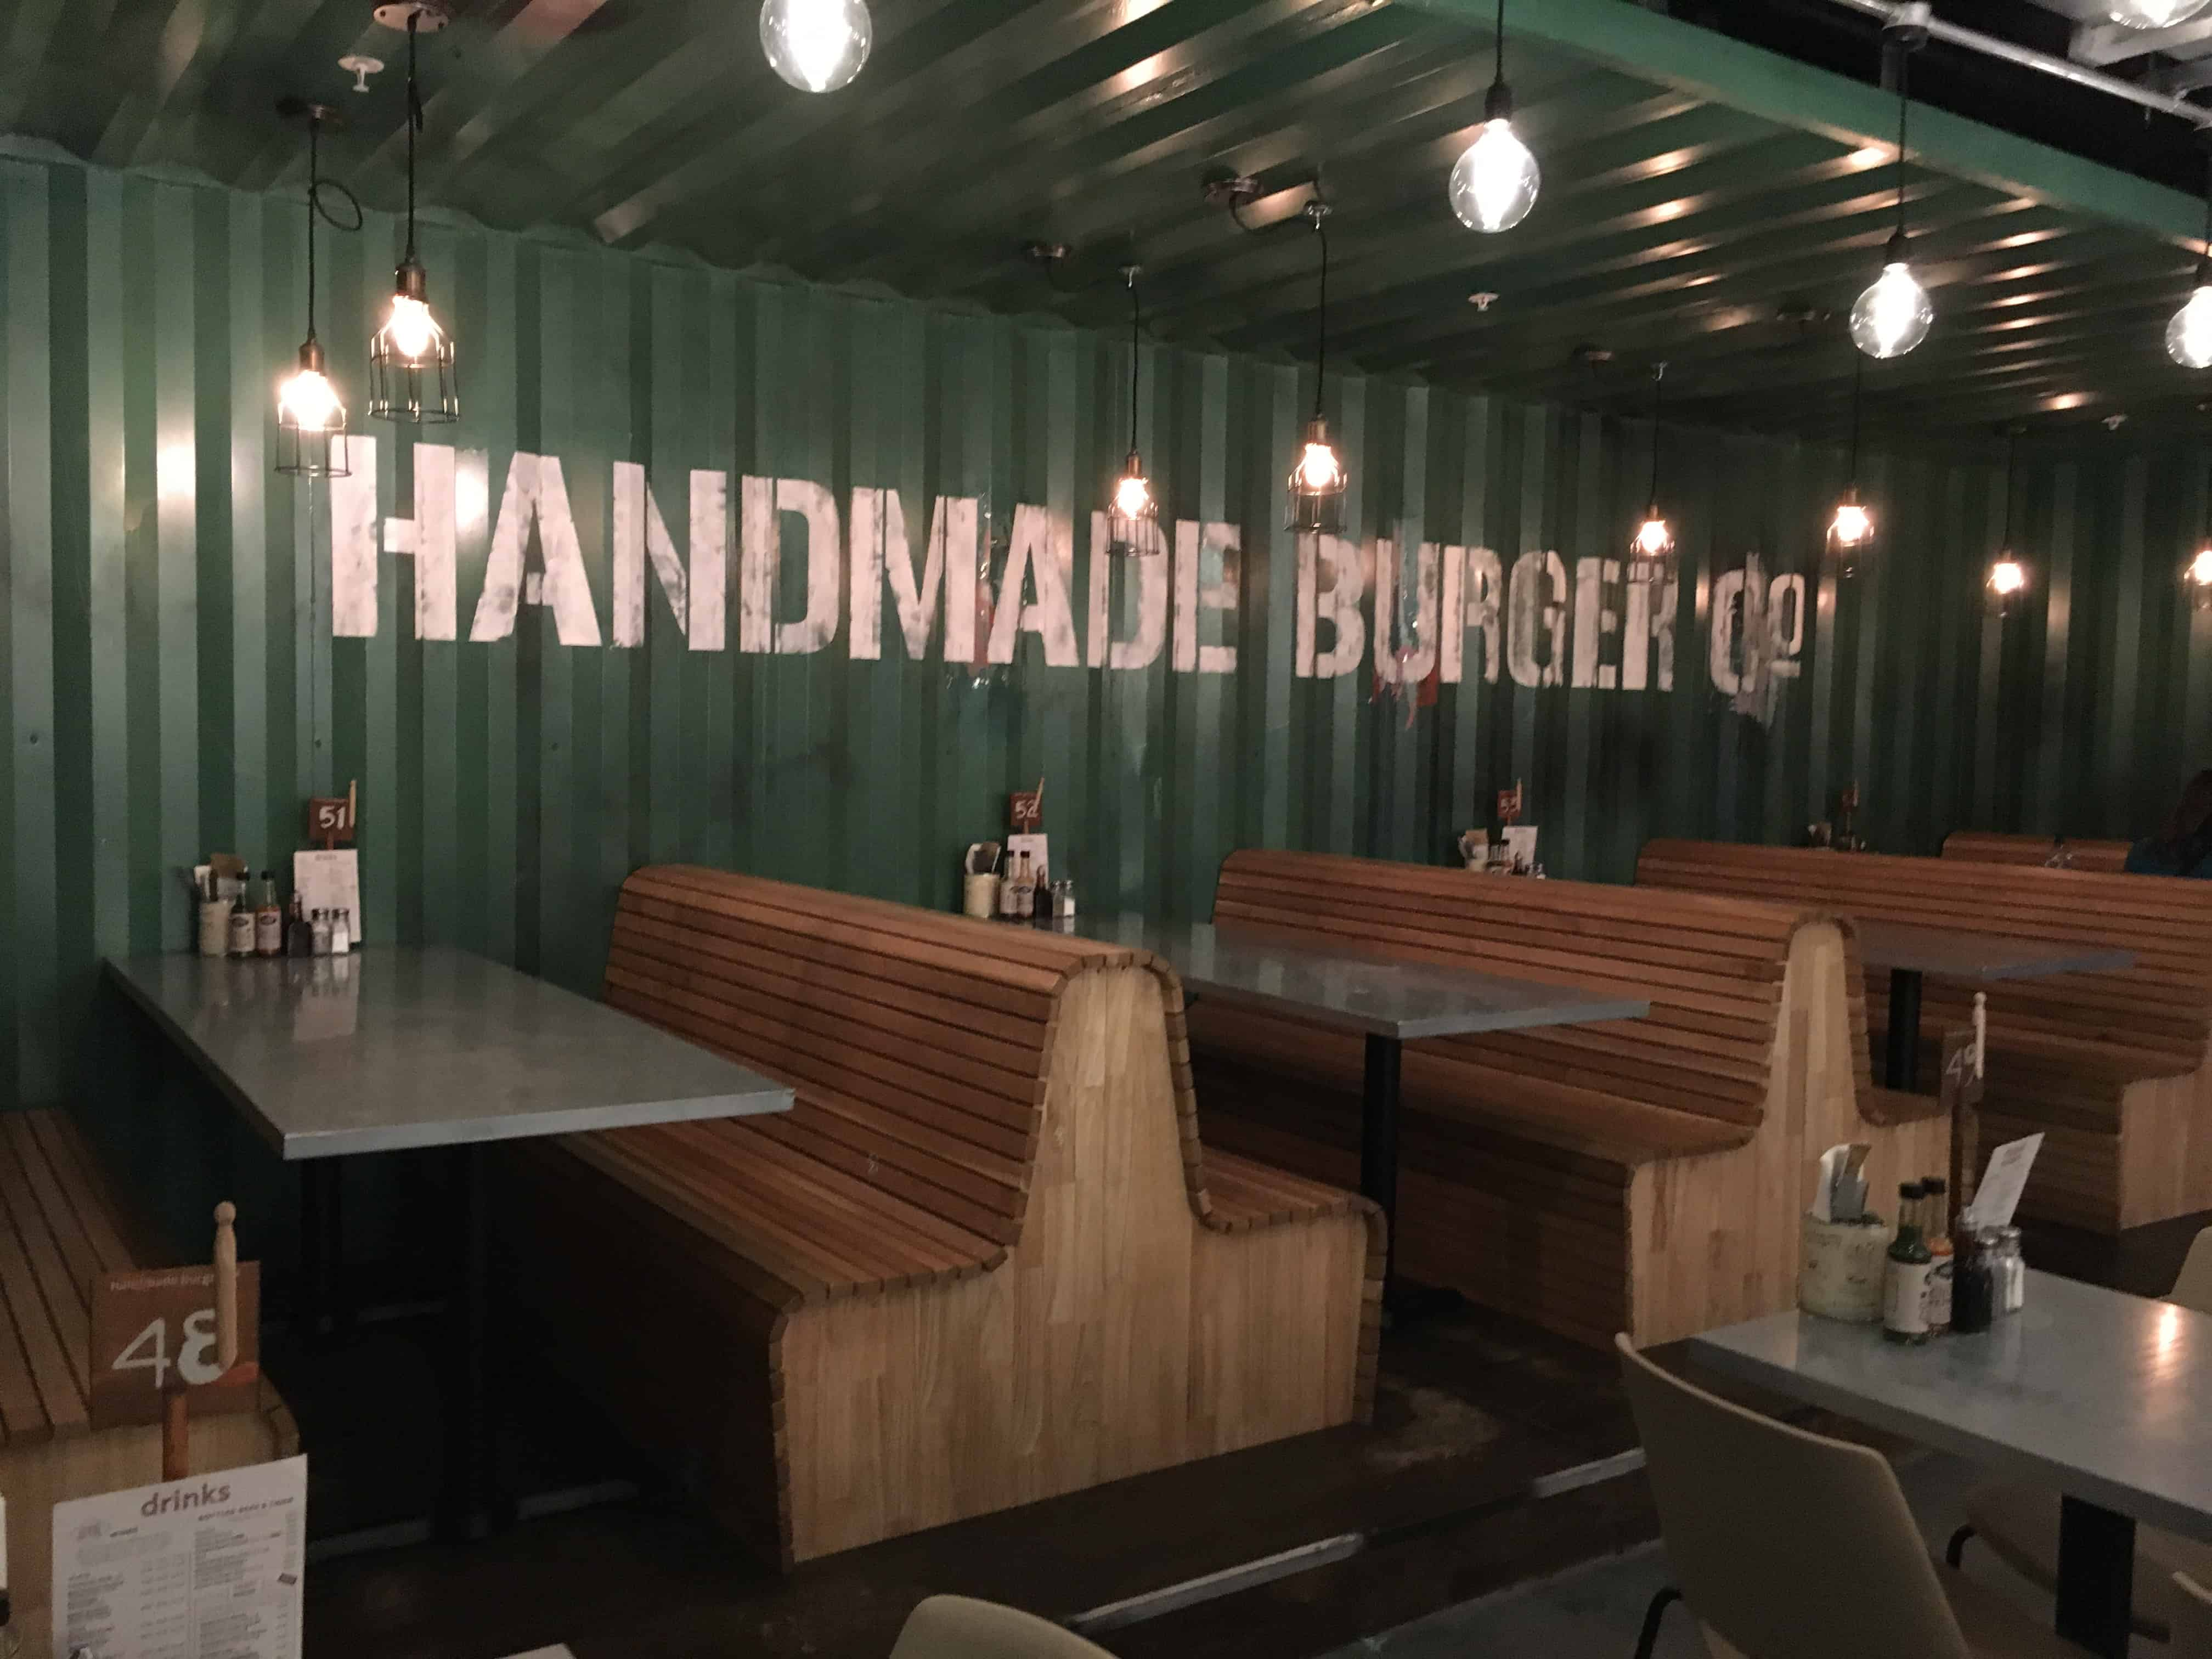 Handmade Burger Co Grand Central Birmingham